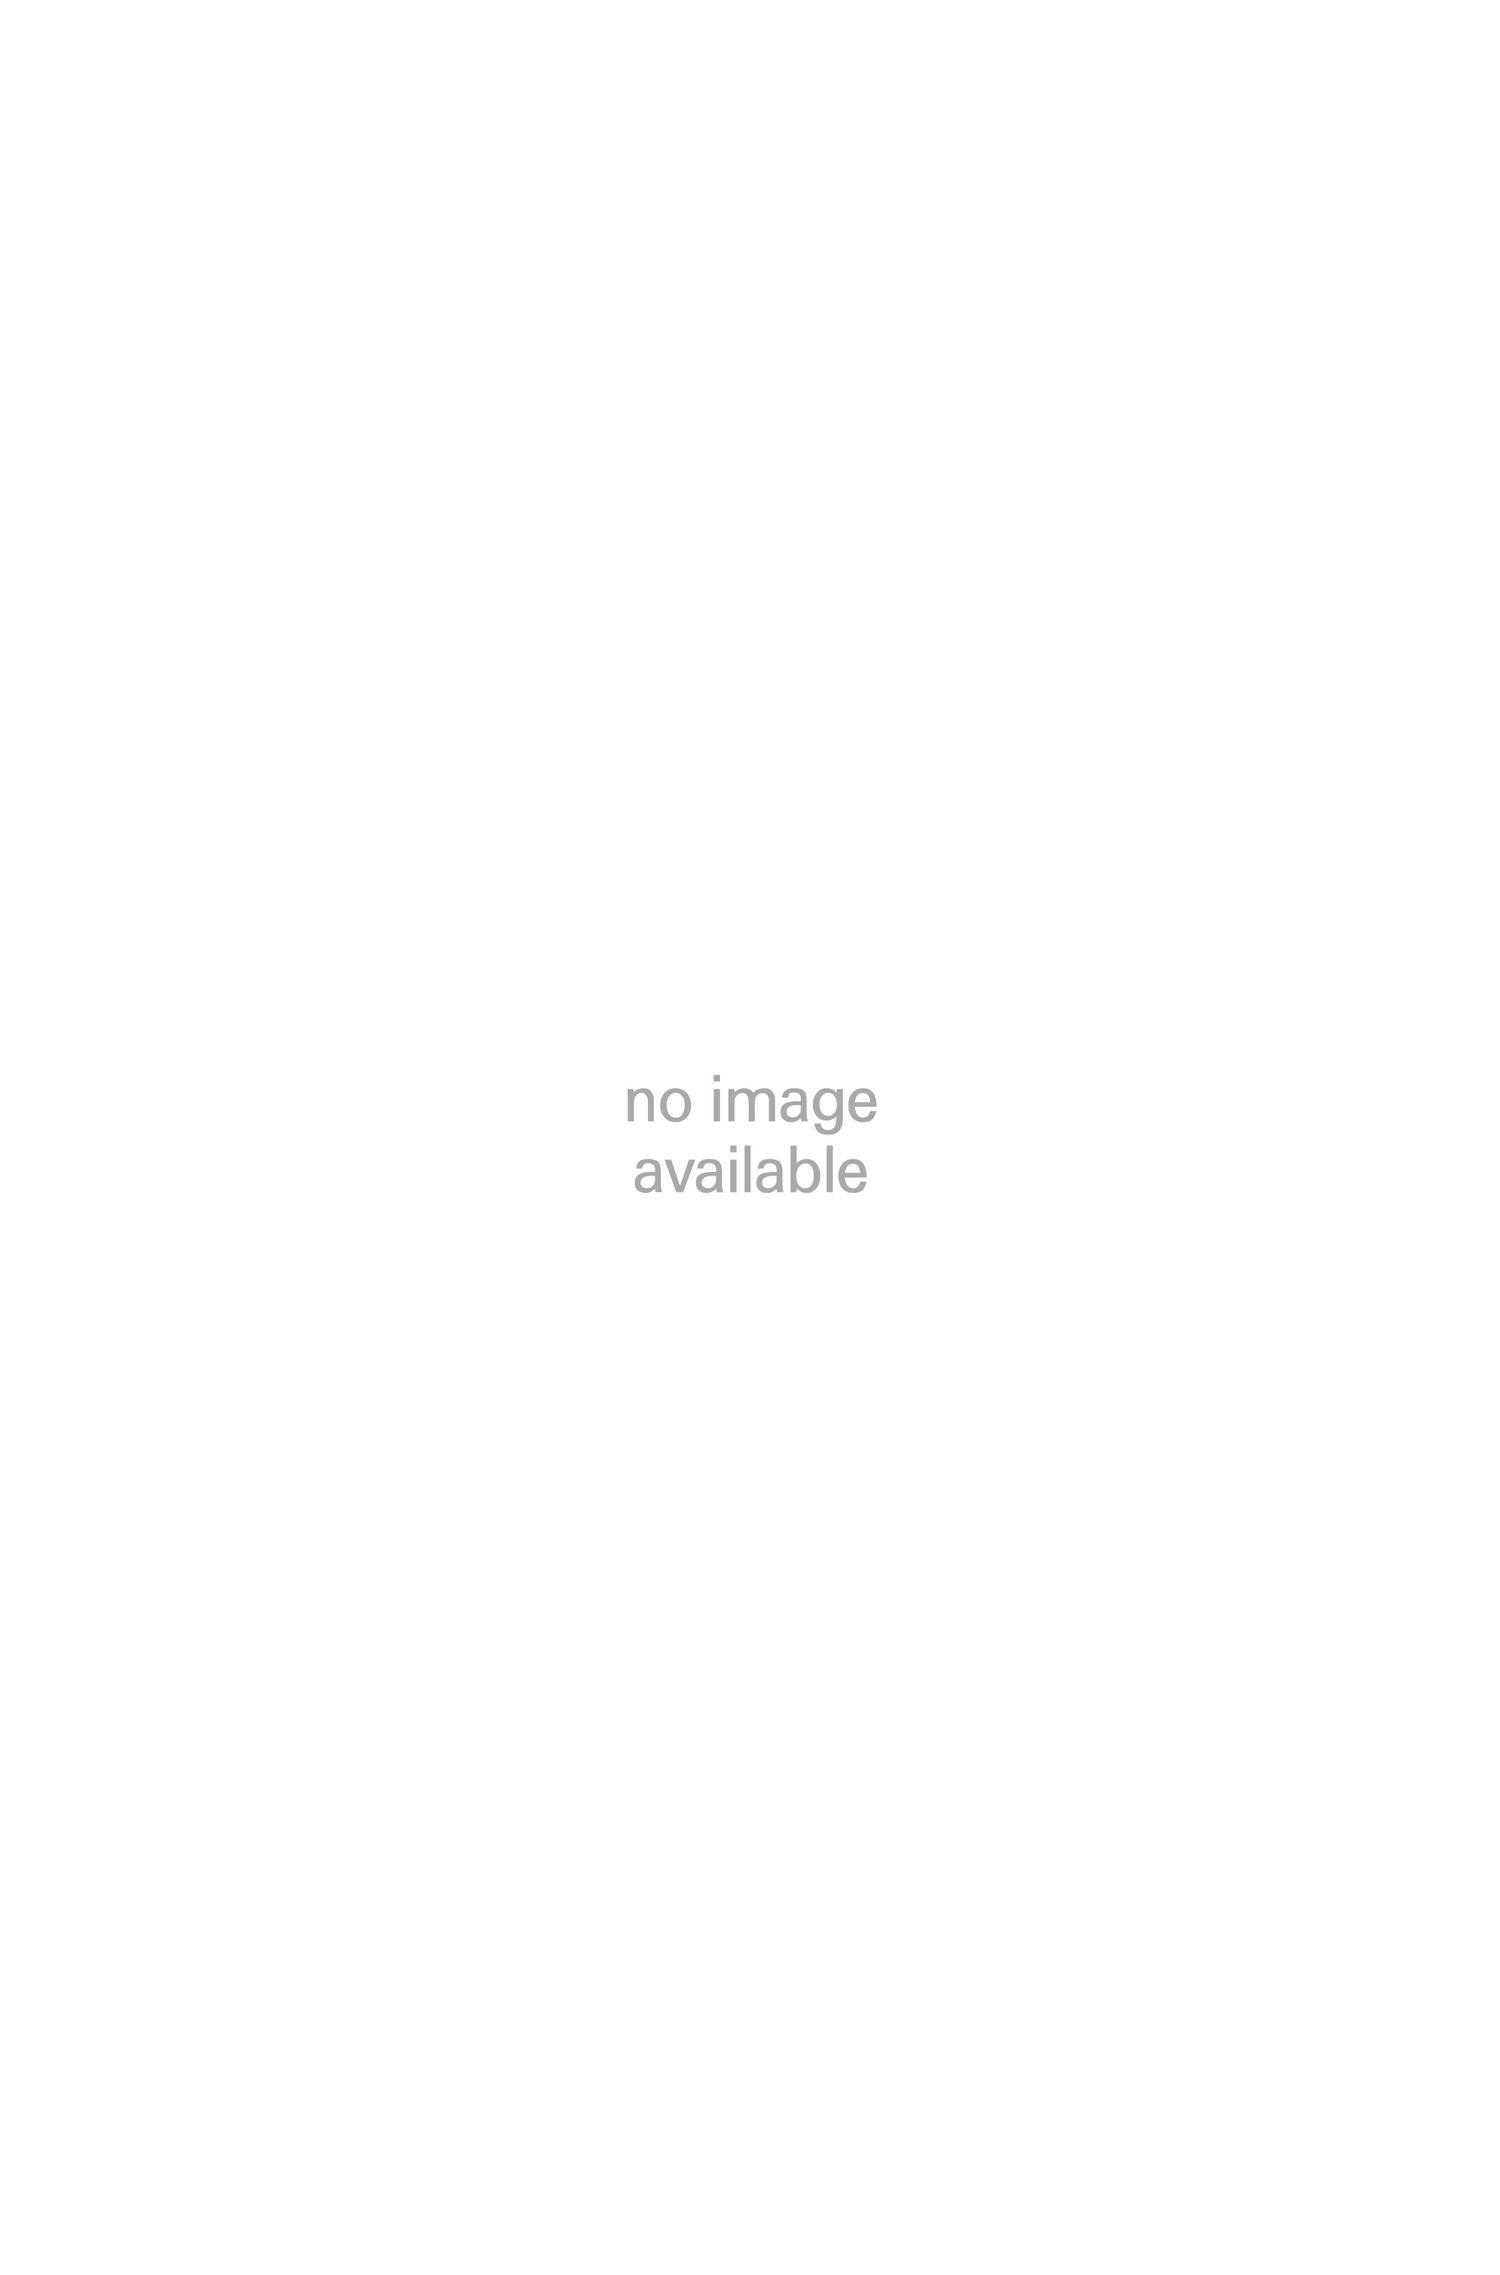 Casquette légère en jersey stretch à logo incurvé, Beige clair